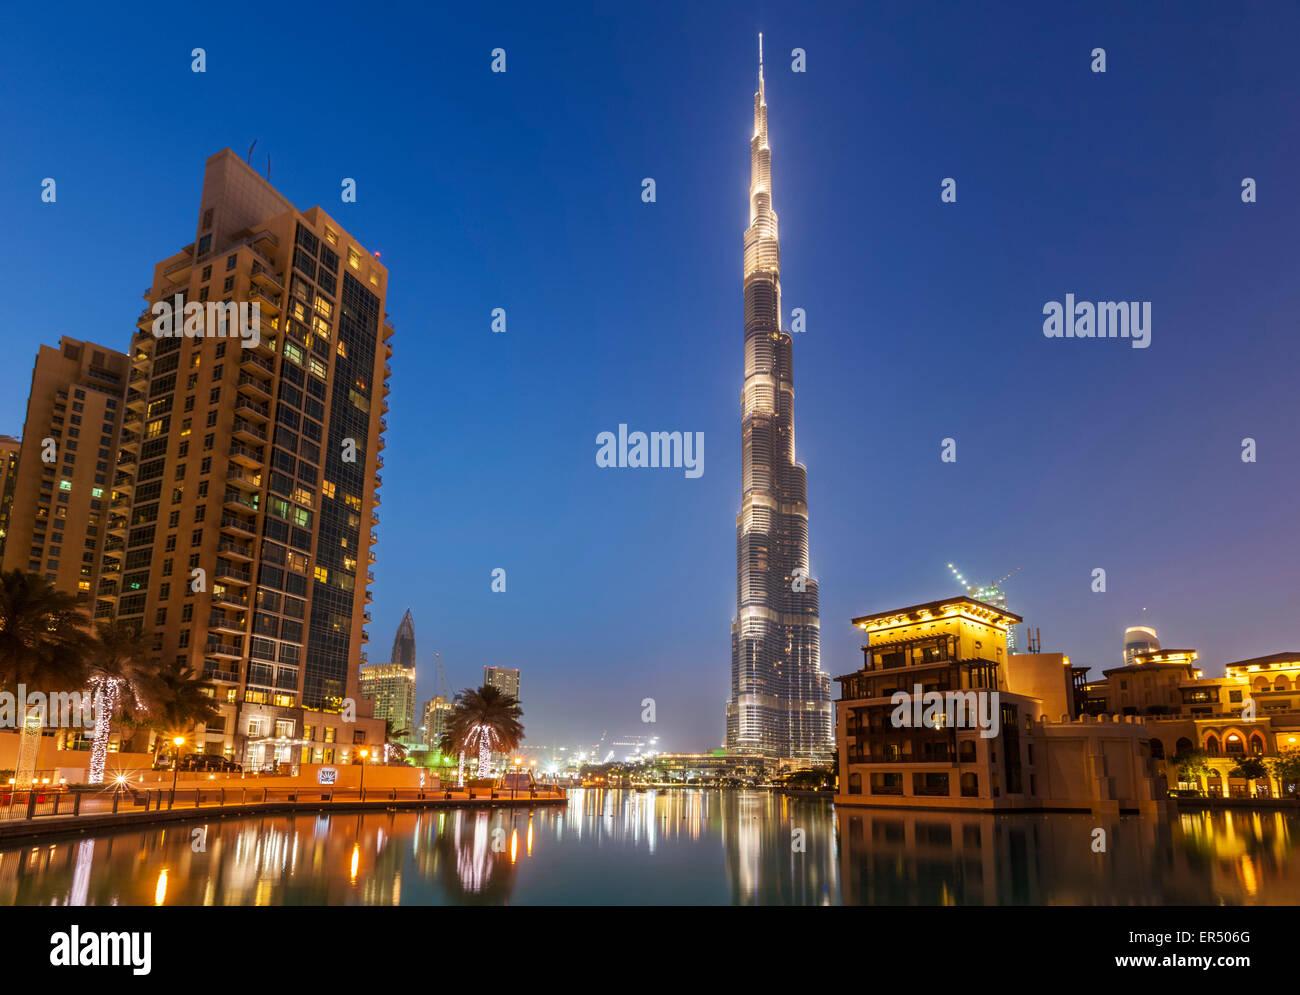 Buj Khalifa illuminata di notte, città di Dubai, Emirati Arabi Uniti, Emirati arabi uniti, Medio Oriente Immagini Stock